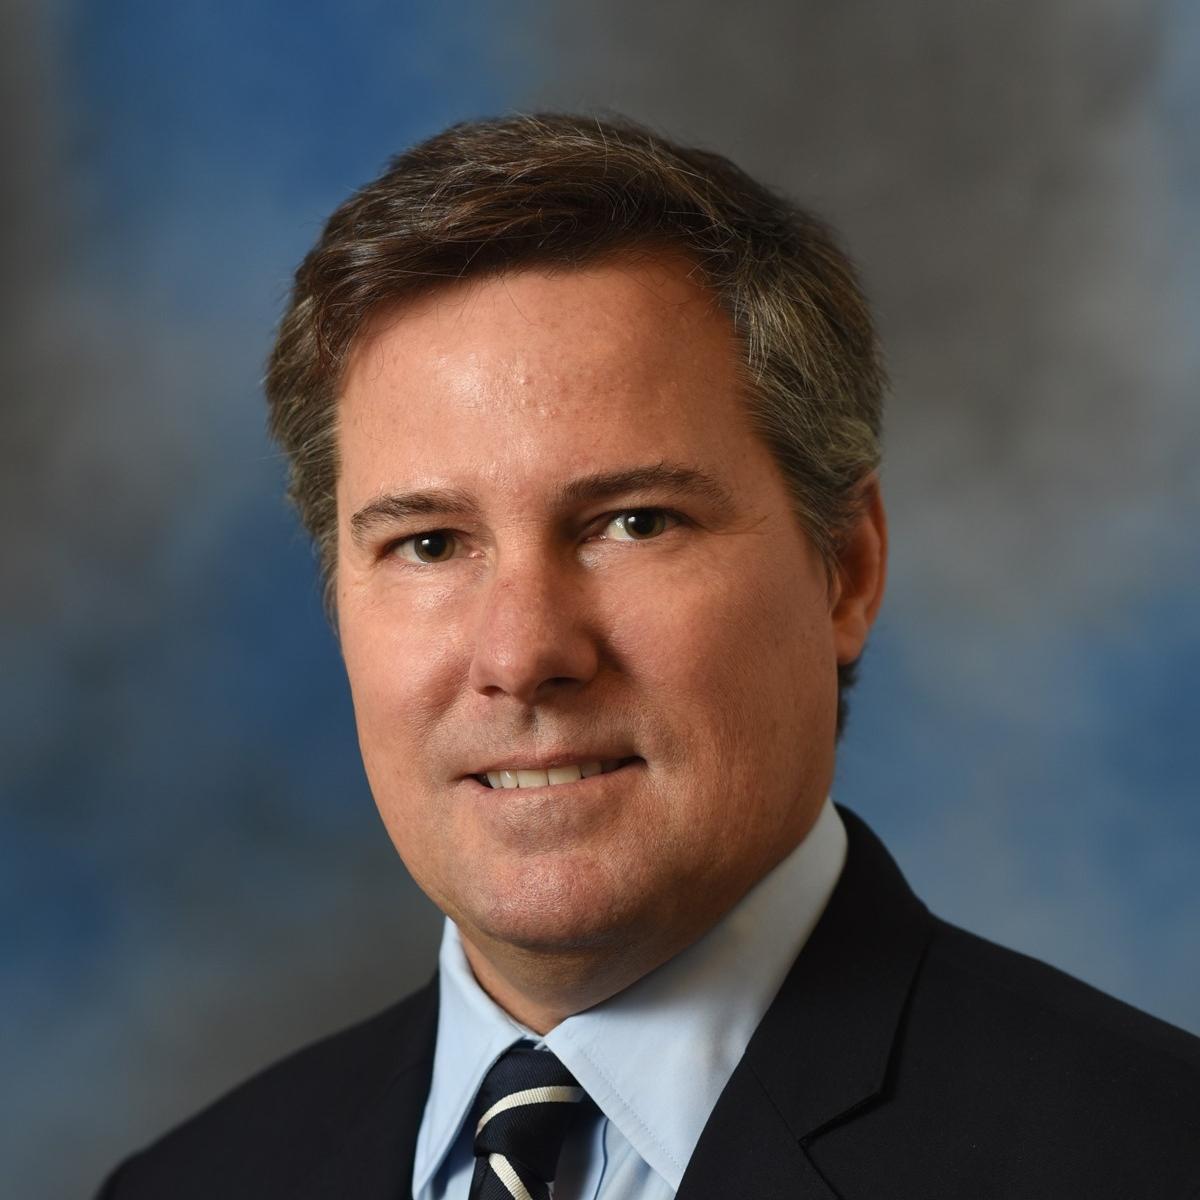 Jonas Kumpitch, Treasurer